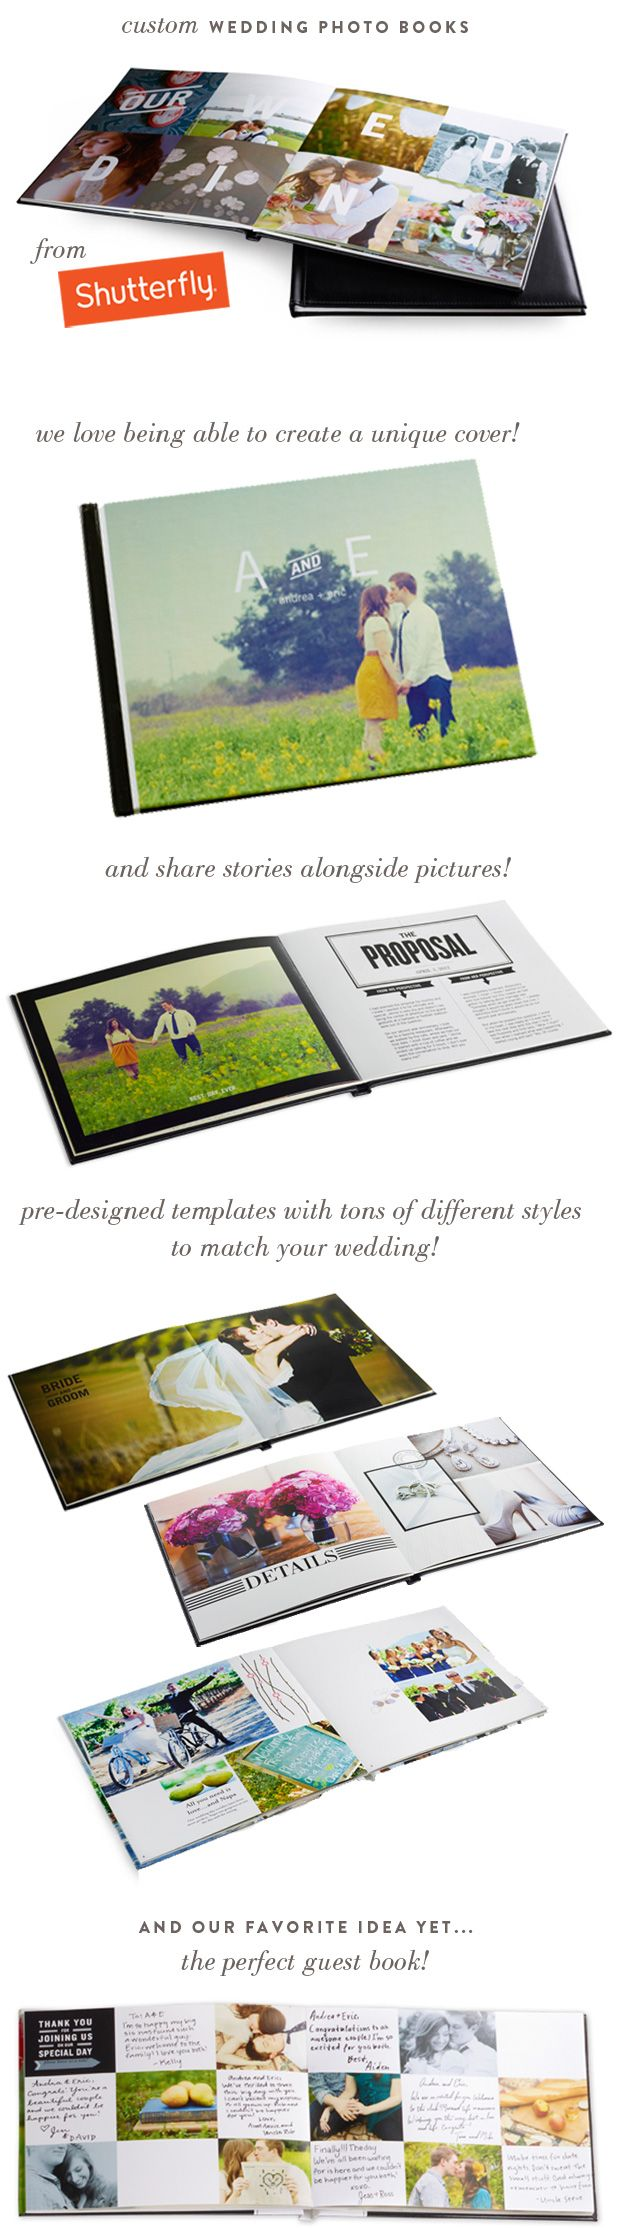 Guest book idea...Wedding Blog – Wedding Colors & Inspiration | Grey Likes Weddings